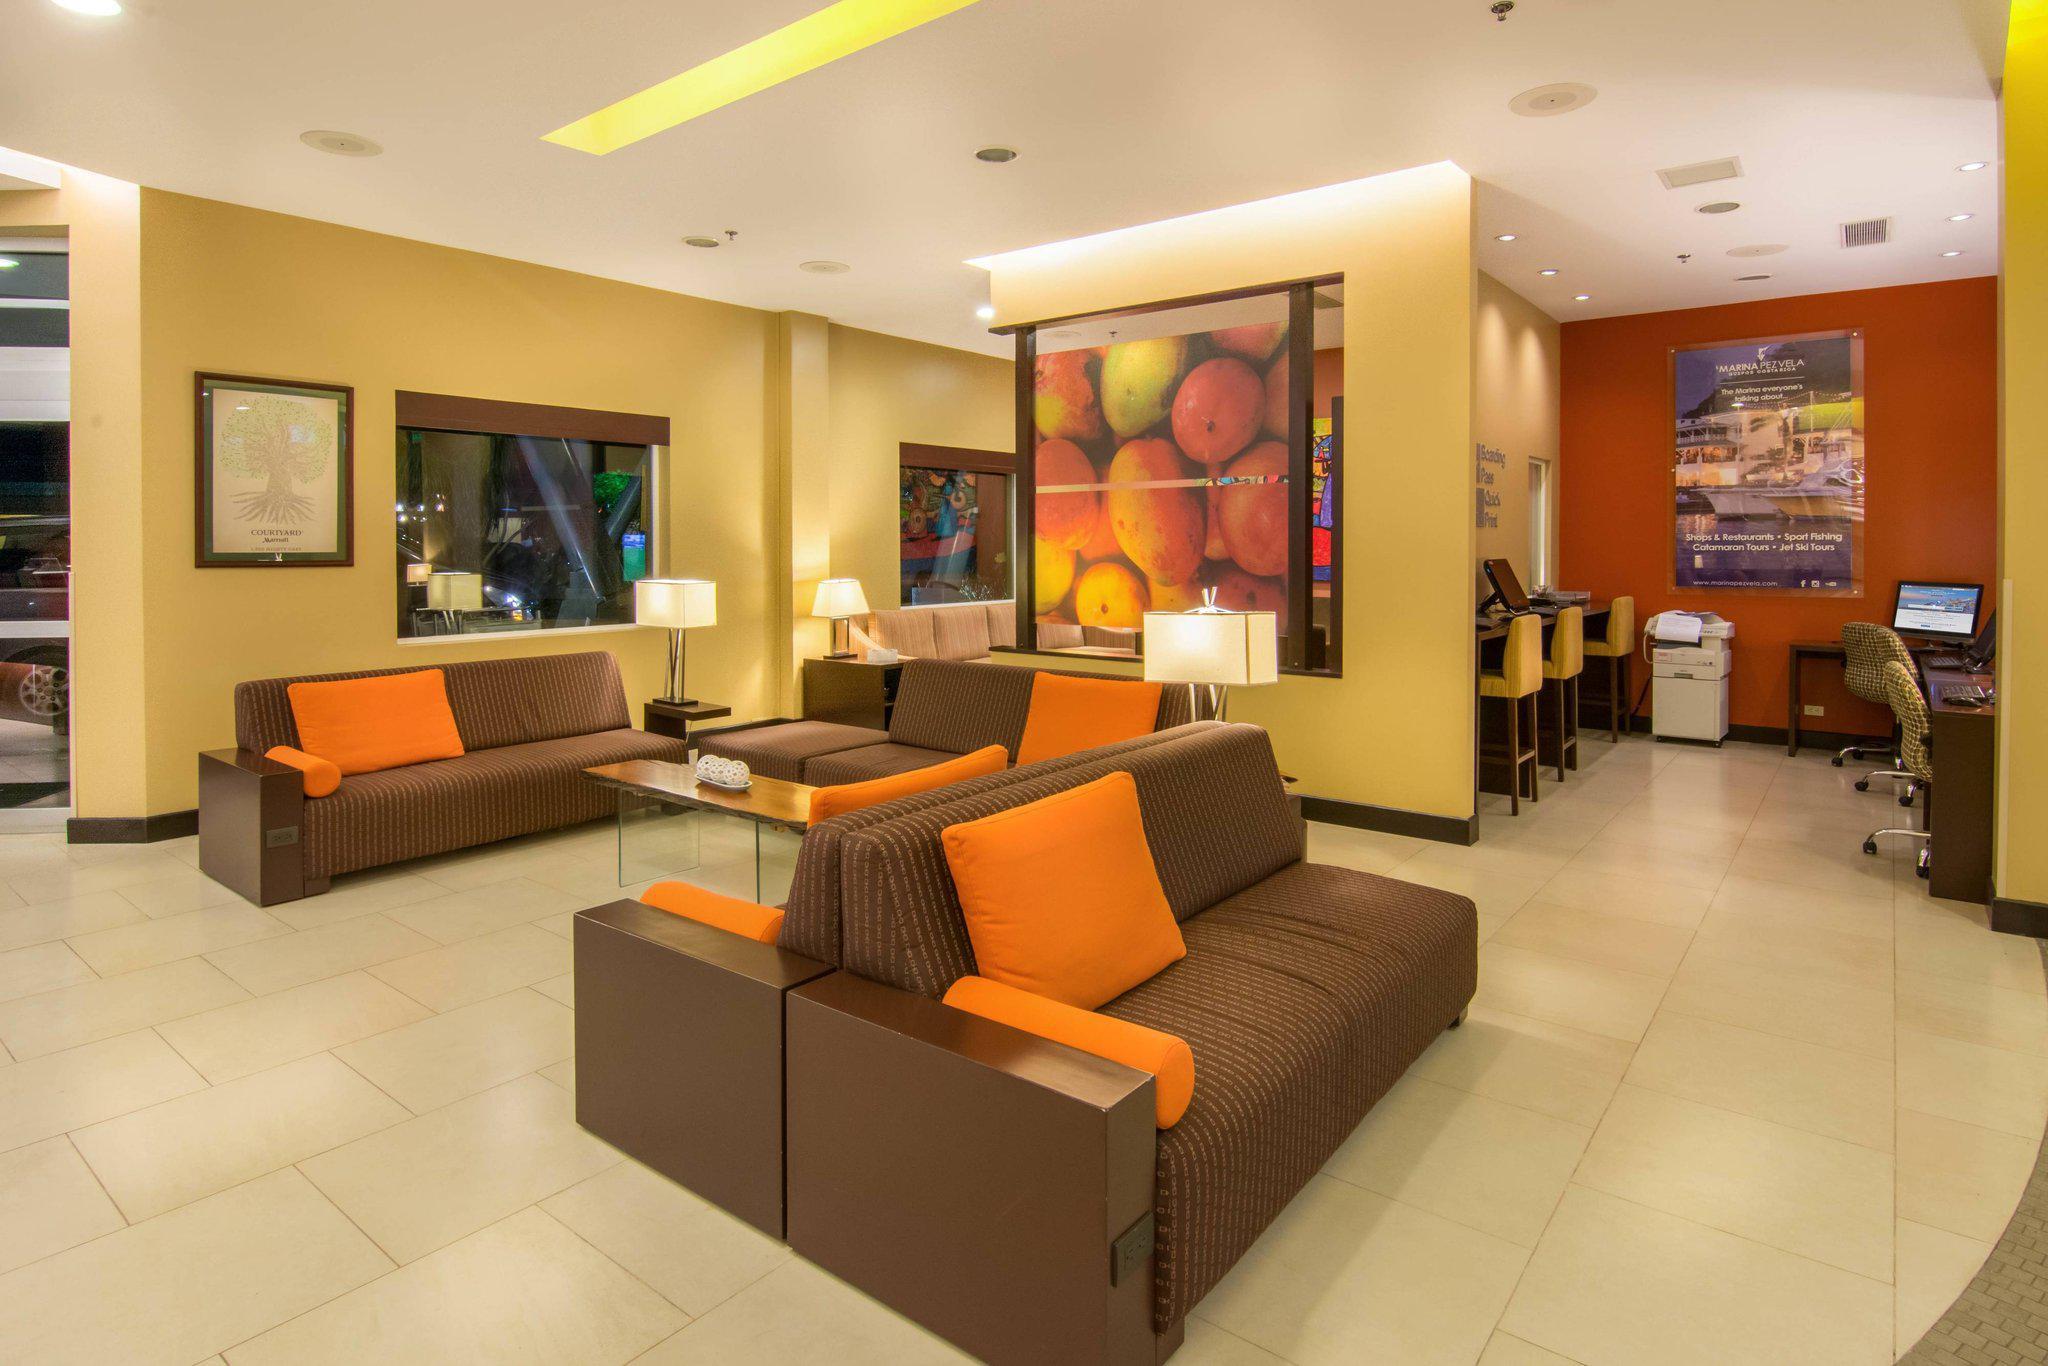 Courtyard by Marriott San Jose Airport Alajuela